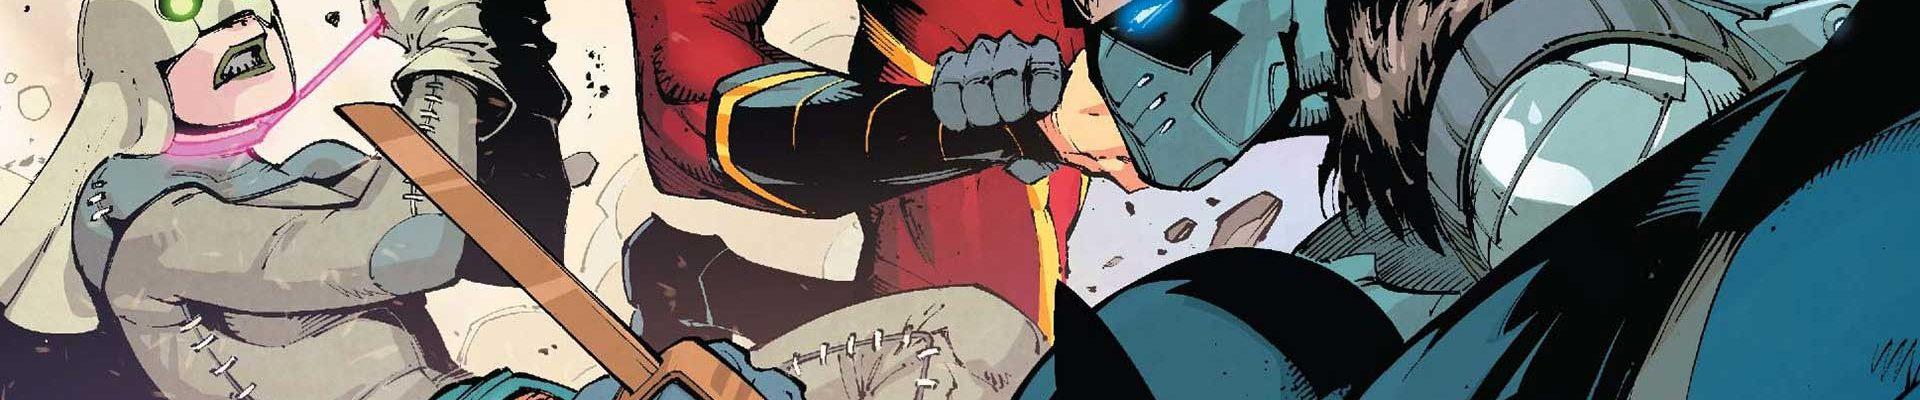 New Superman 4